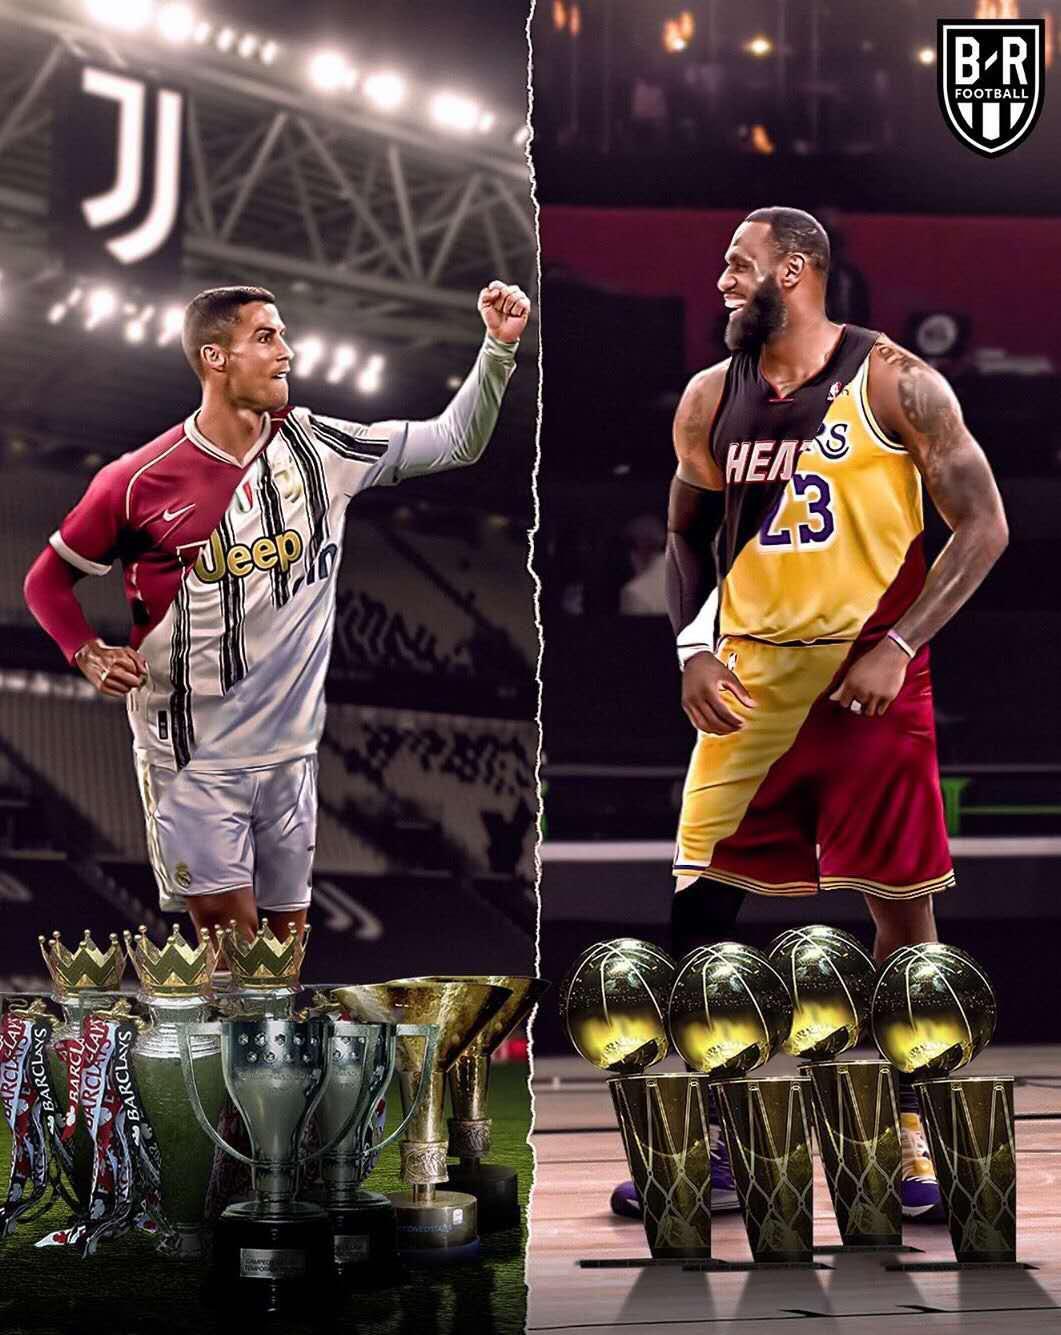 BR对比C罗和詹姆斯:在三支球队获得冠军+MVP的传奇